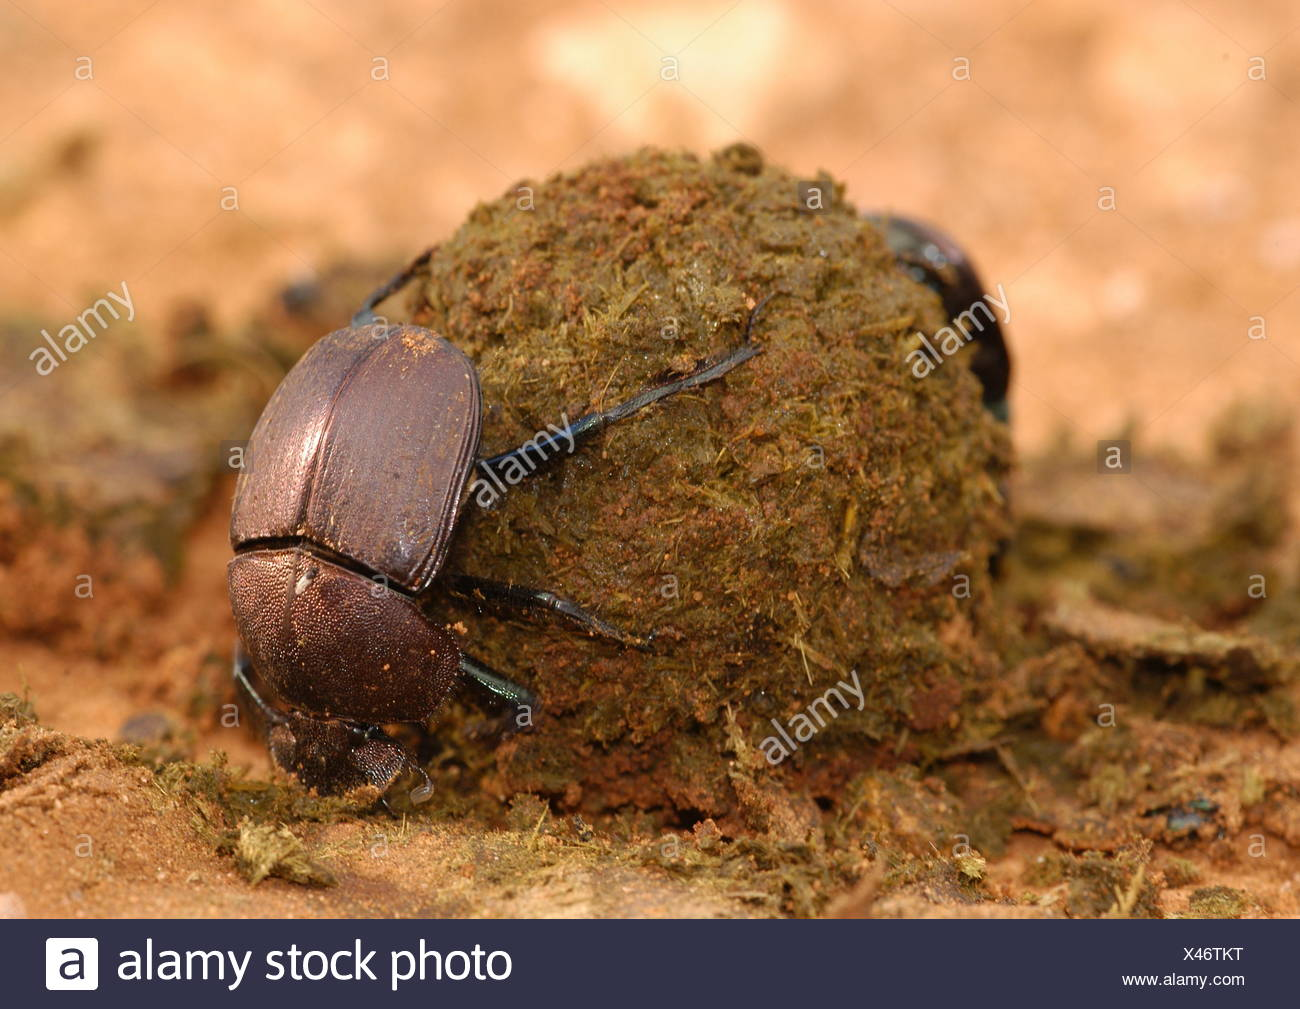 zoology animals insects beetles scarabaeidae dung beetle